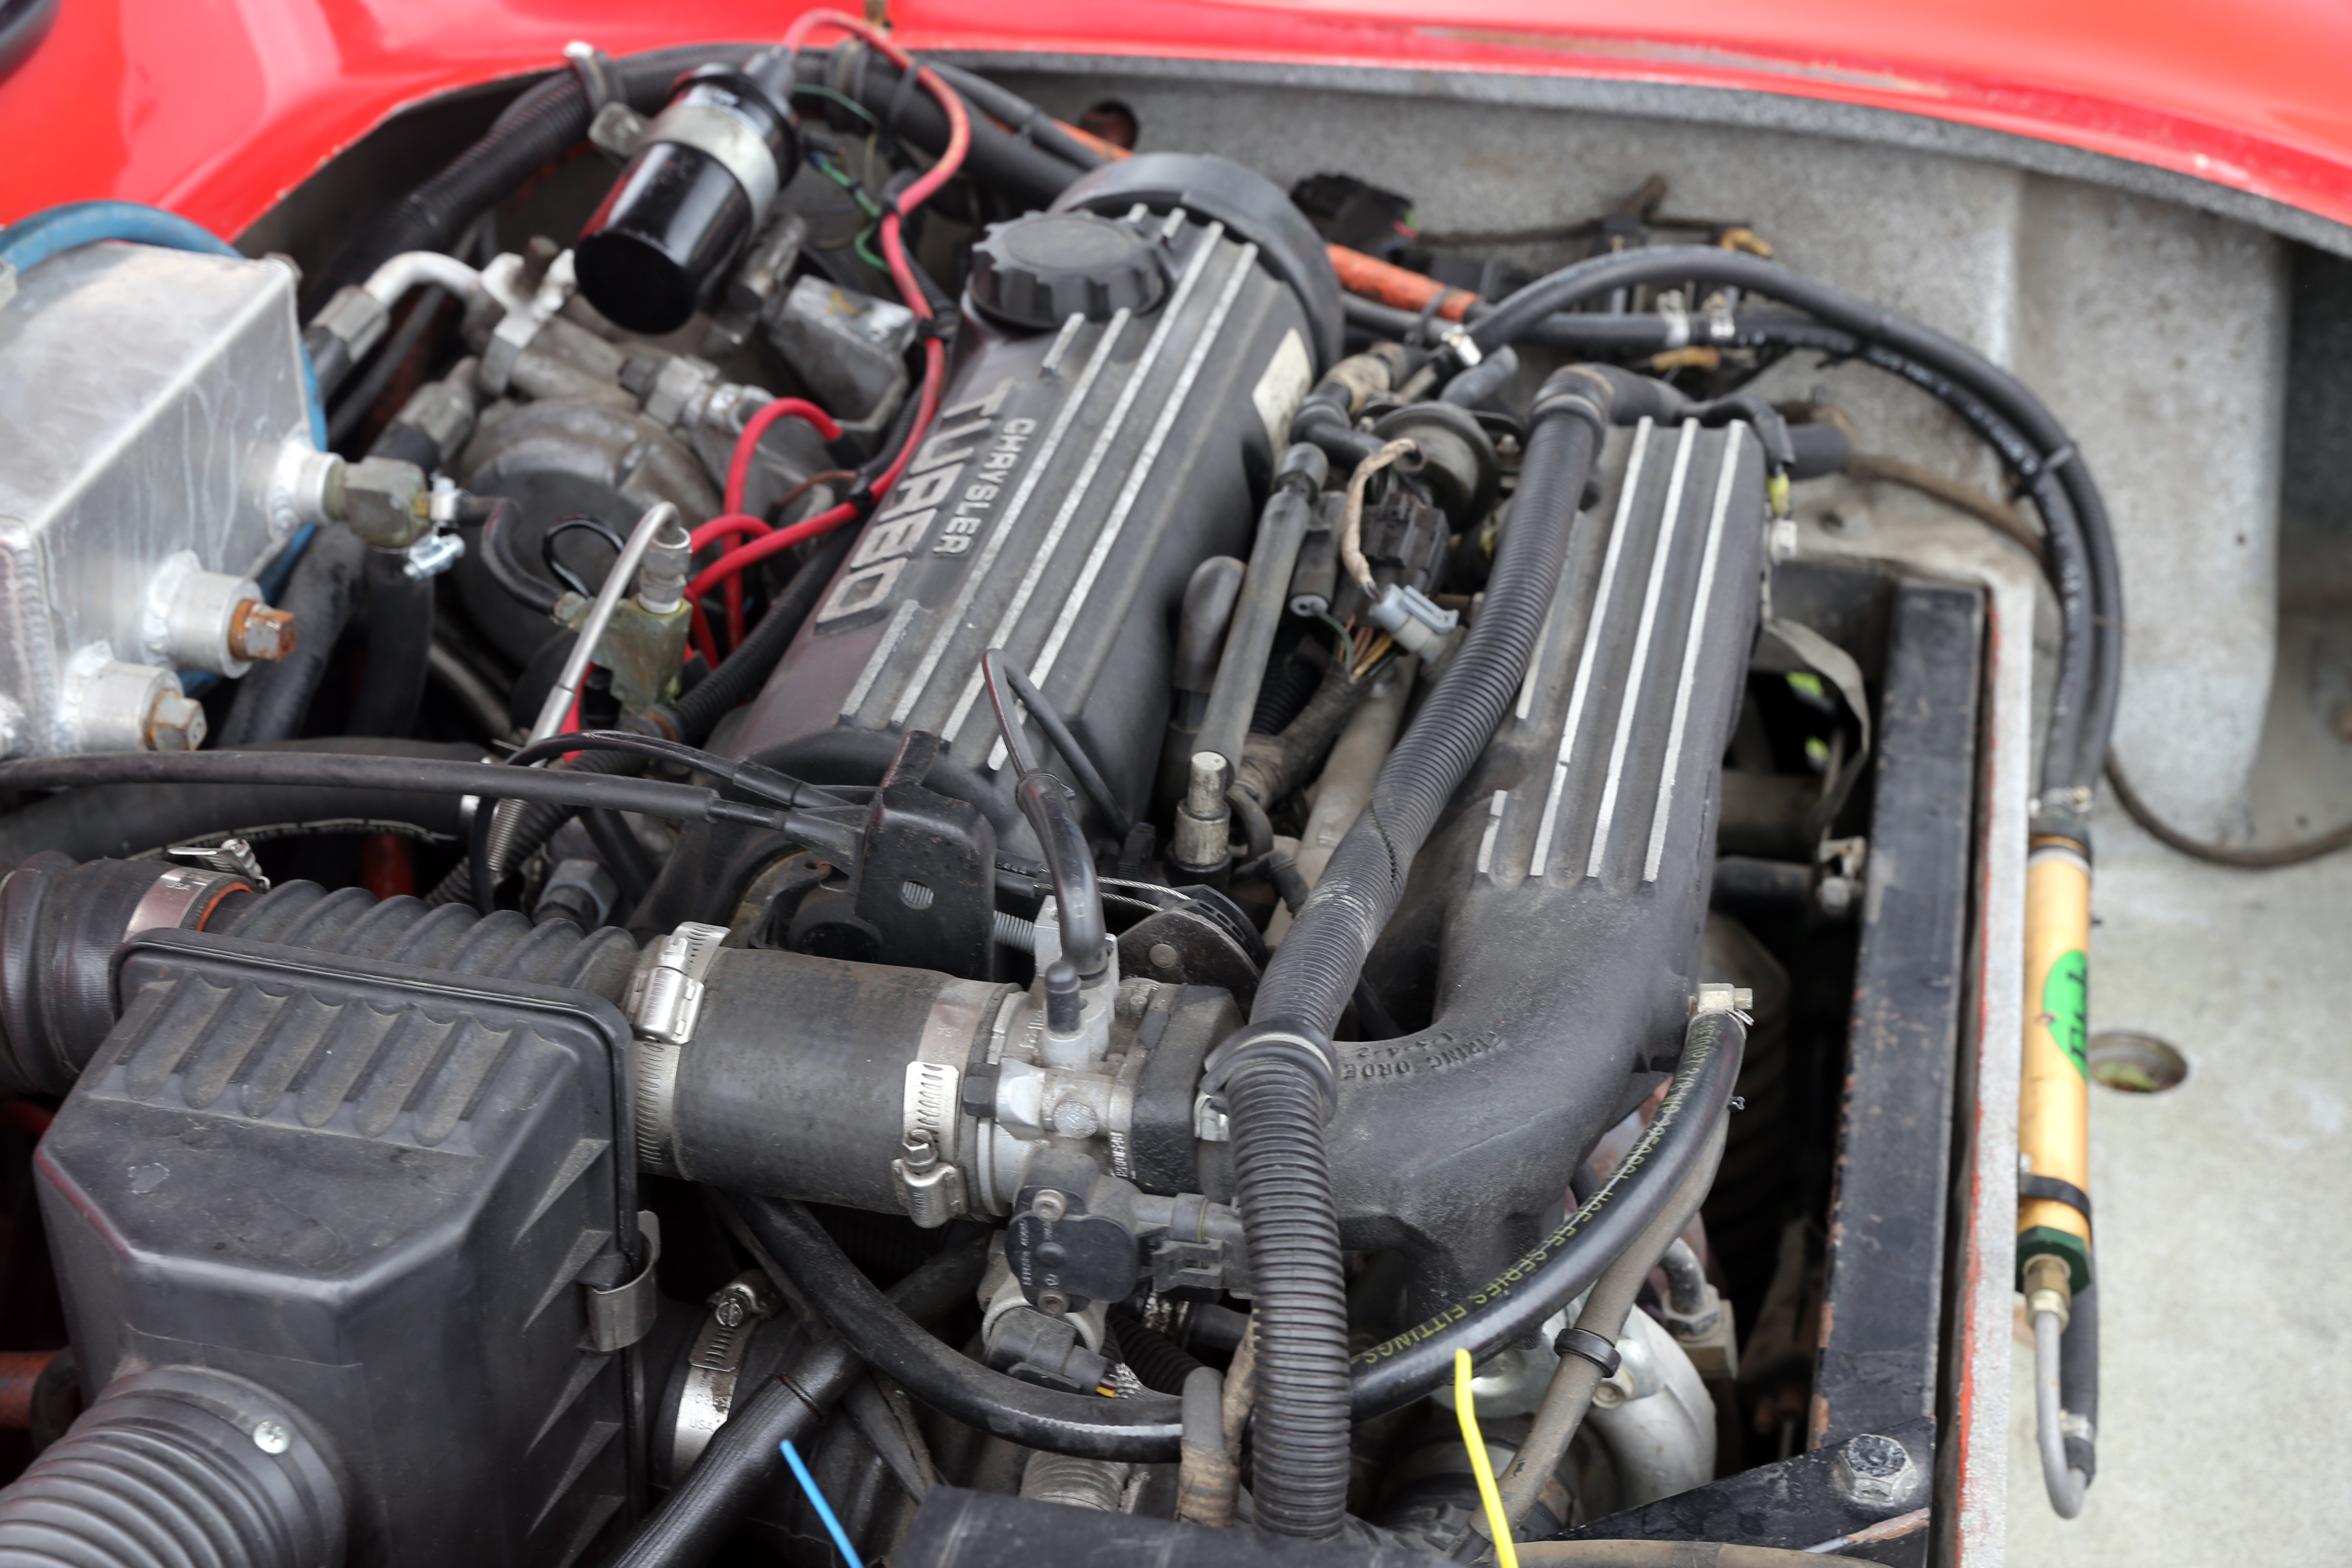 Chrysler 22 25 engine Wikipedia – Rt 100 Engine Diagram